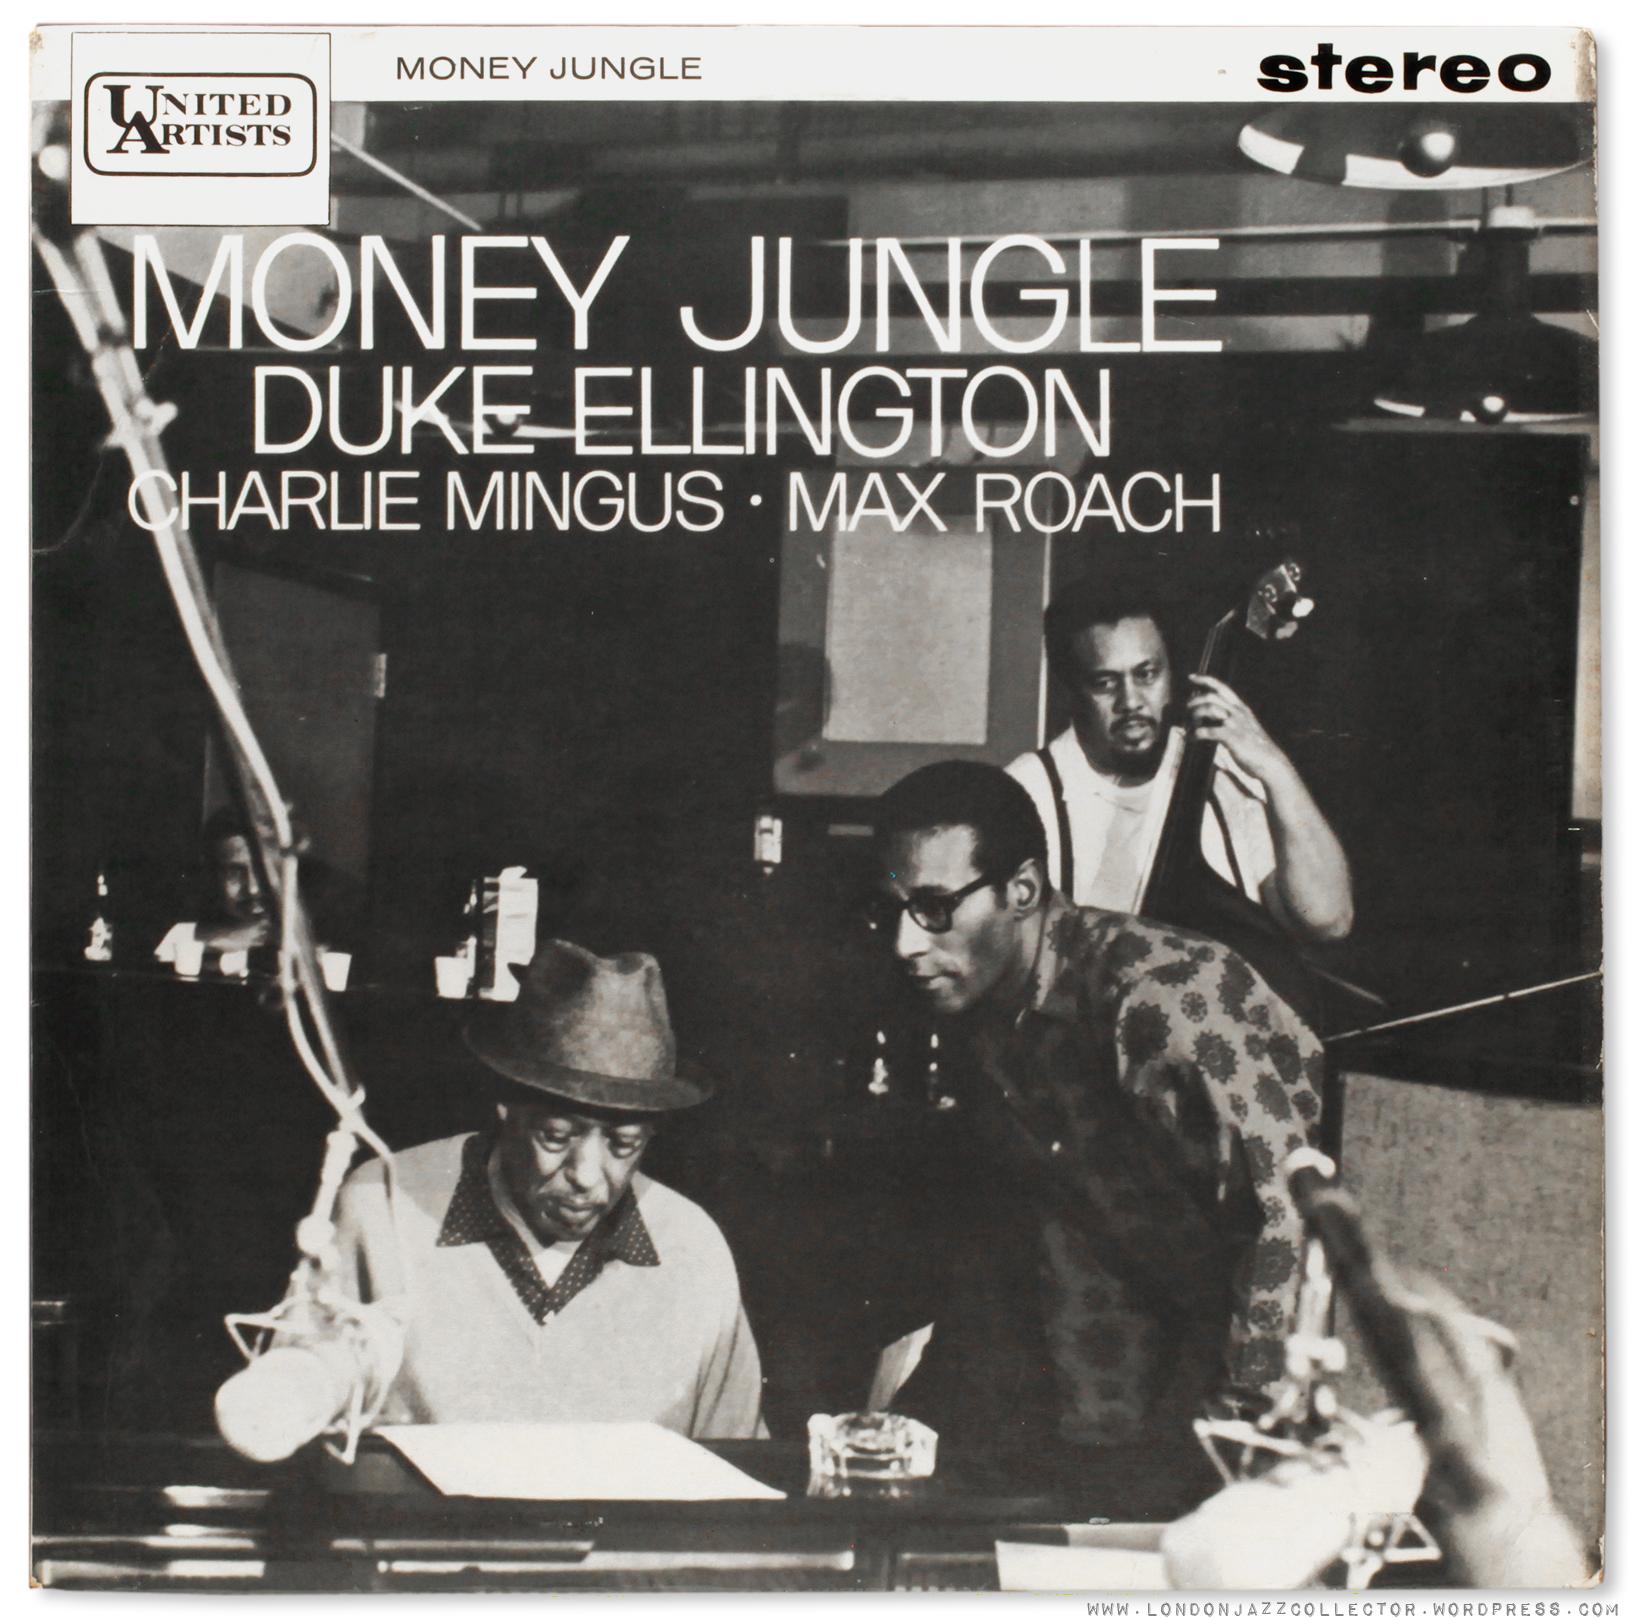 Duke Ellington: Money Jungle (1962) UK United Artists | LondonJazzCollector